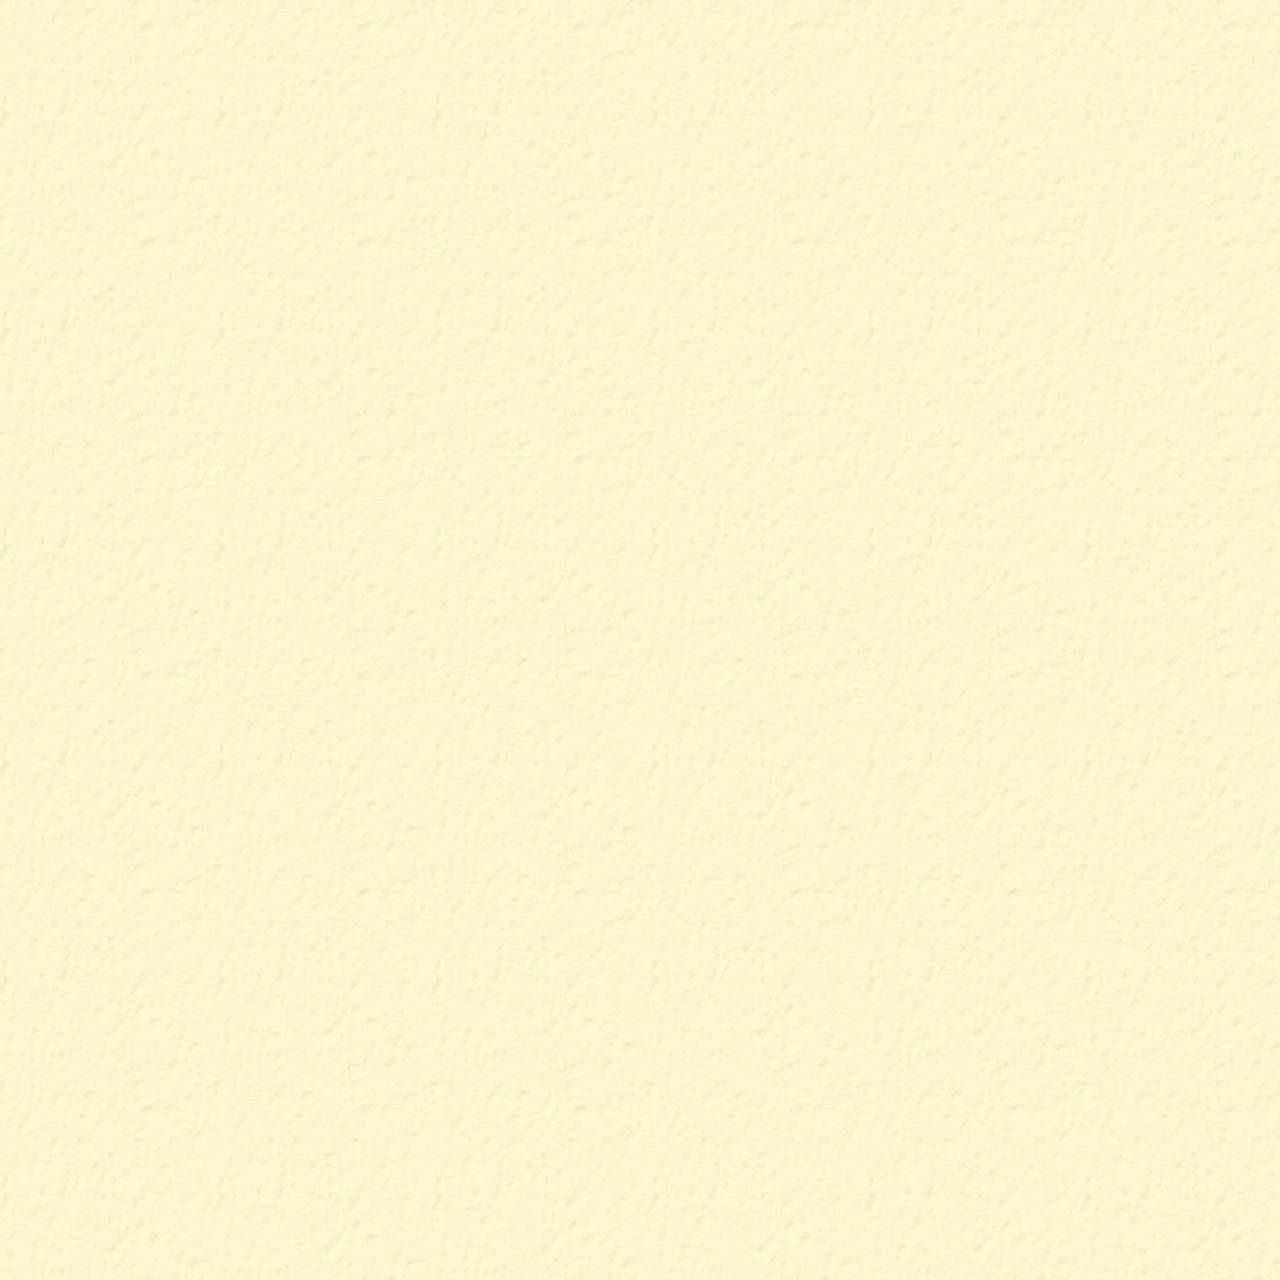 K04.0.1 Pearl Yellow